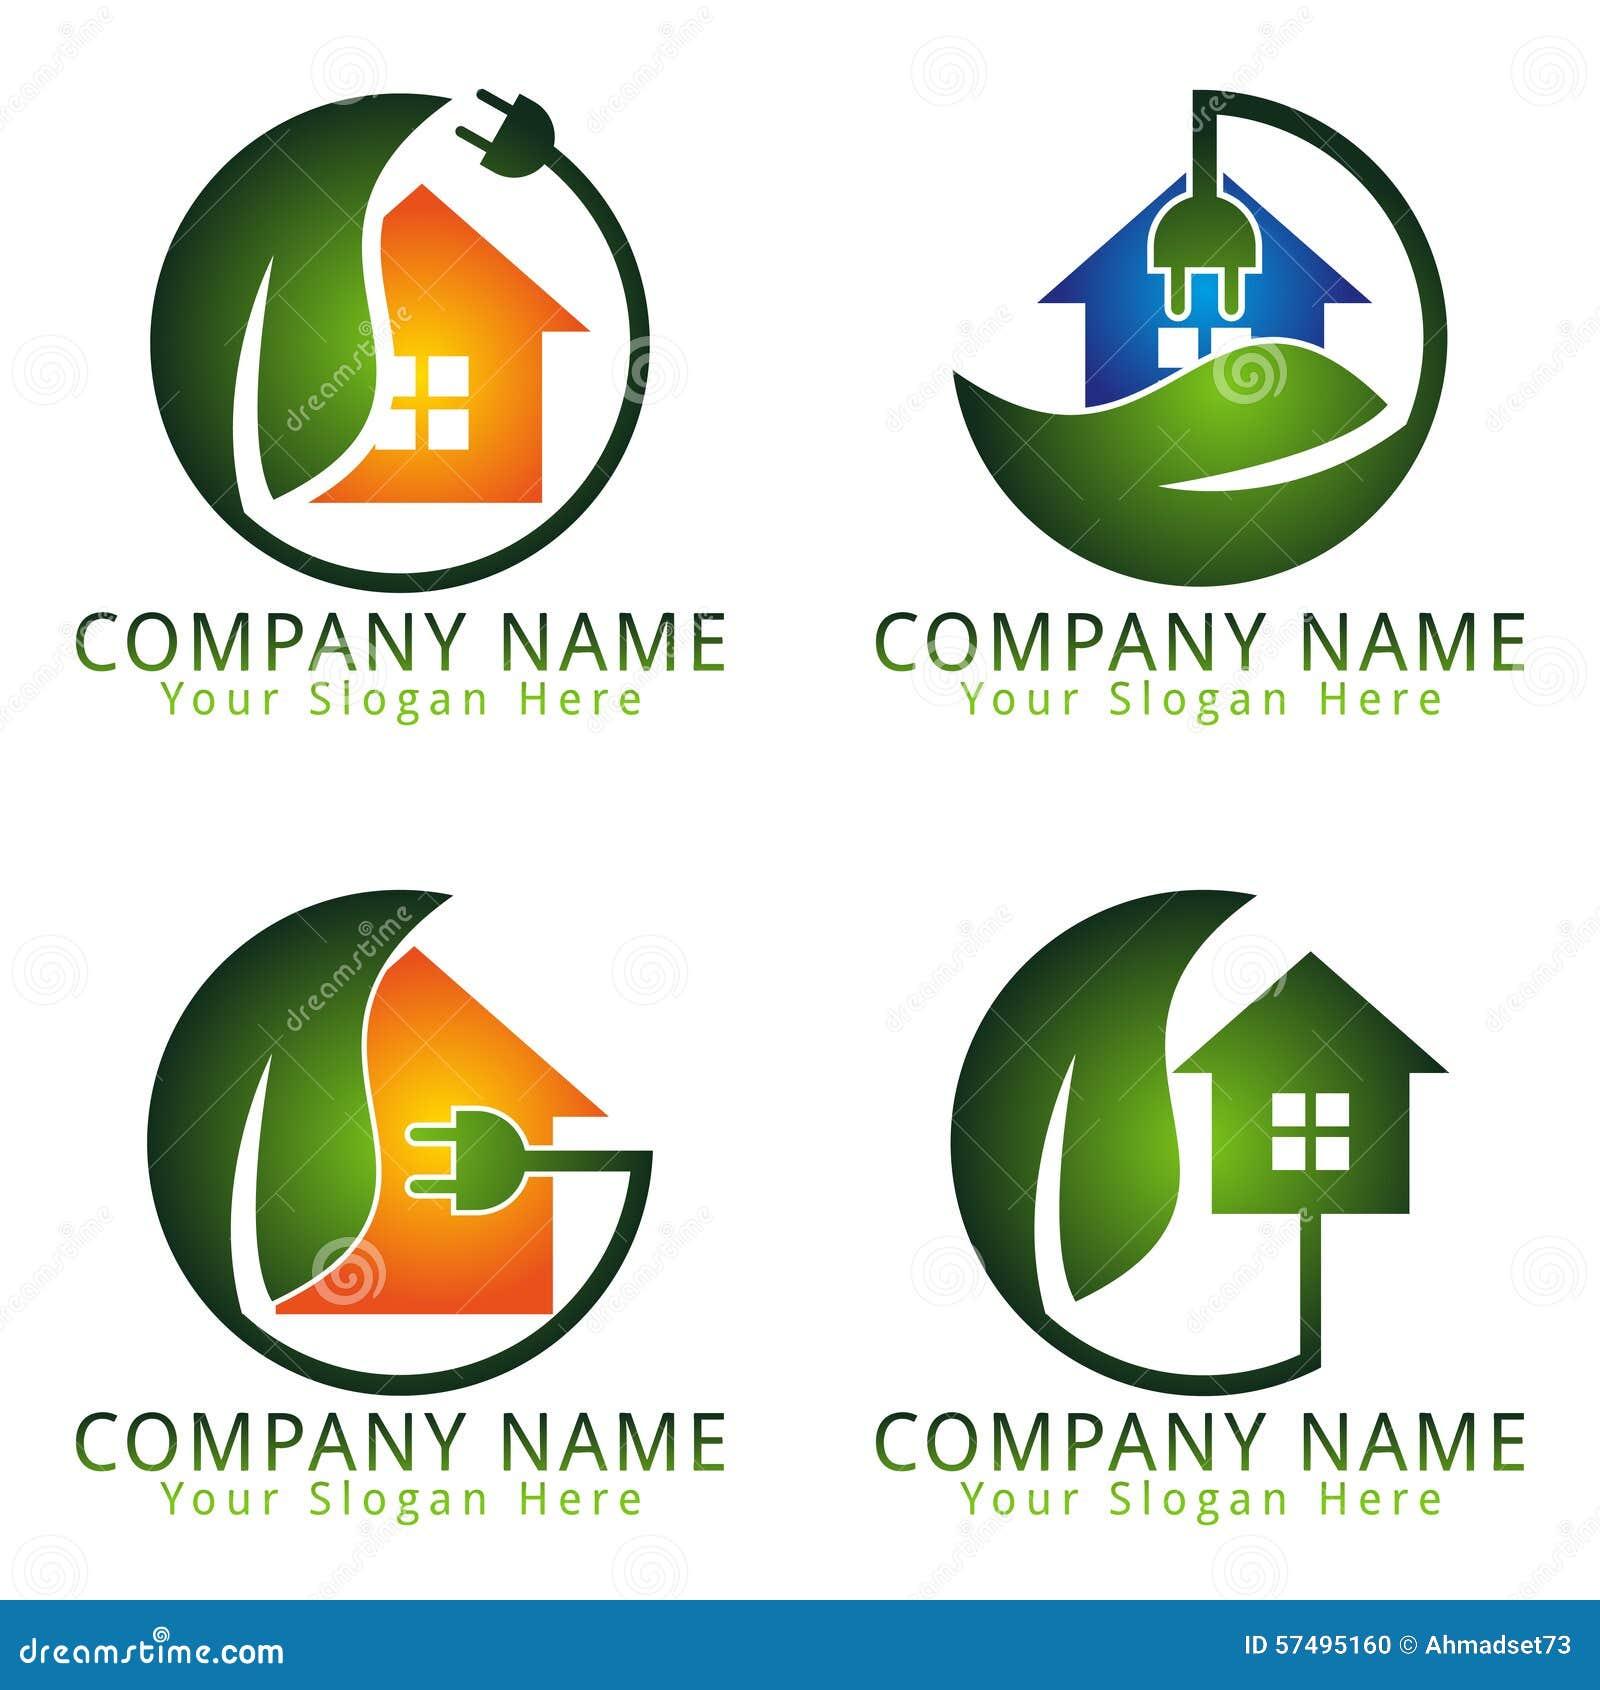 concept of free energy pdf